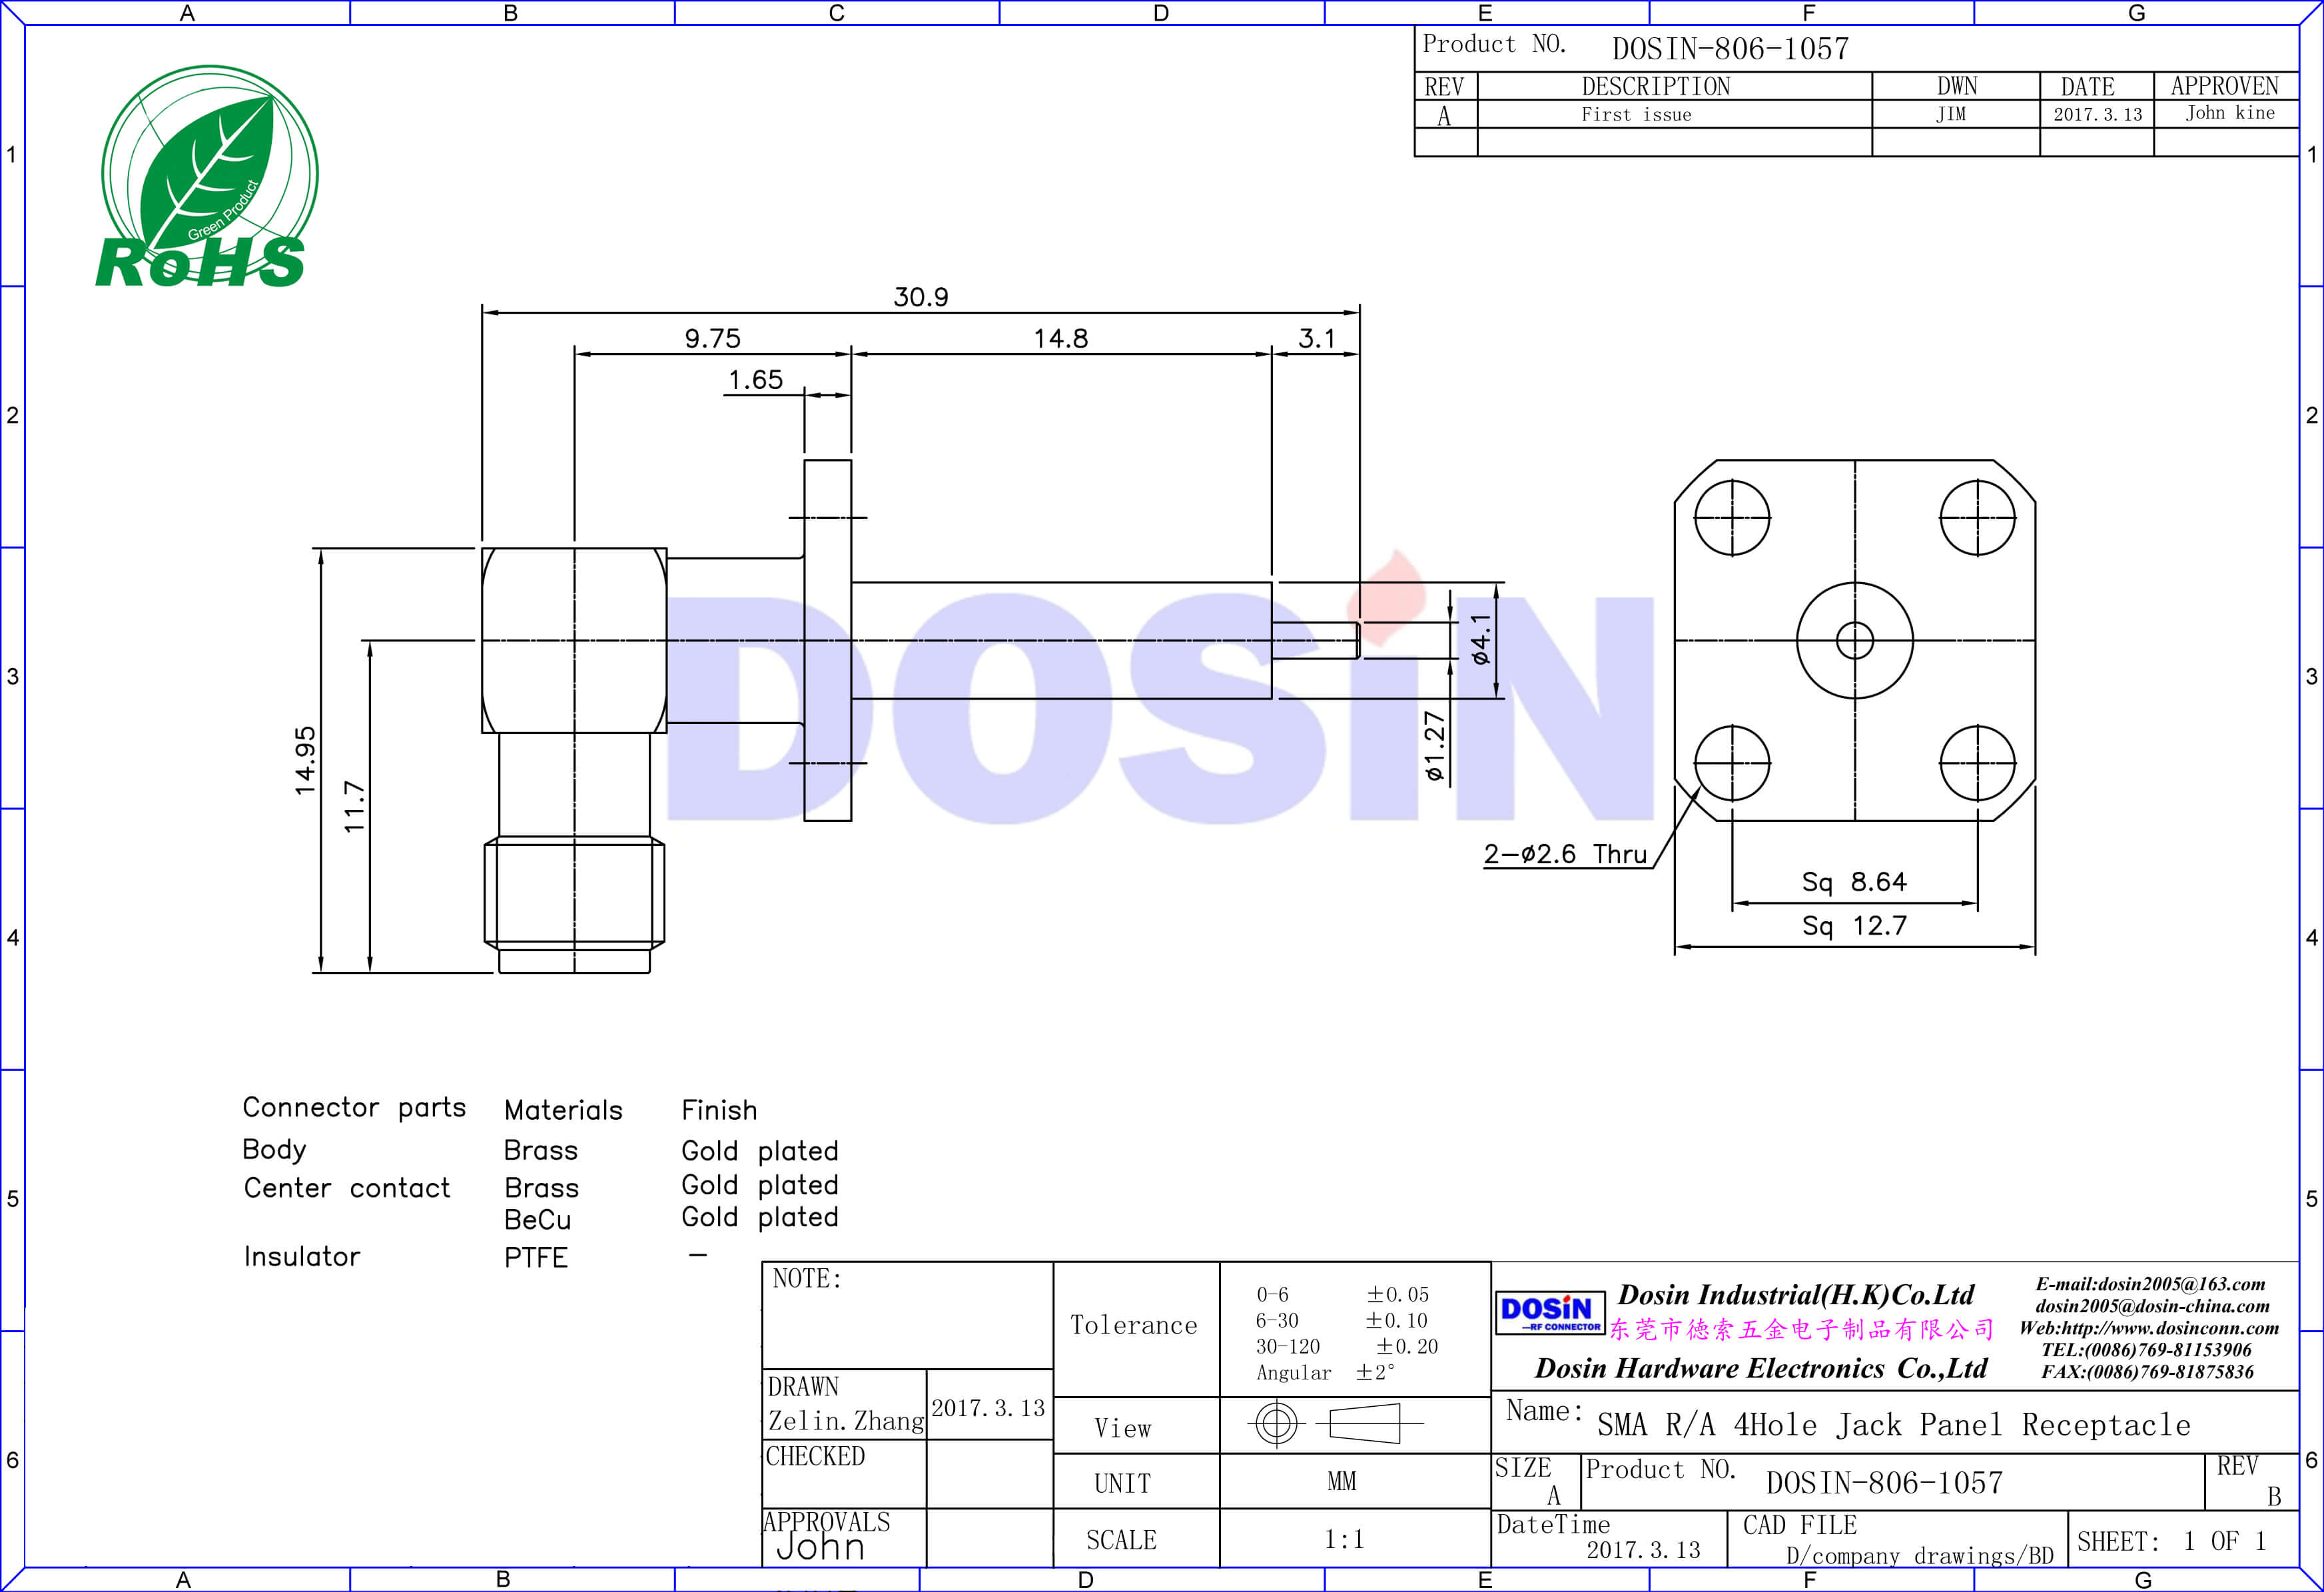 sma4孔镀金法兰面板安装接头延长铁氟龙连接器